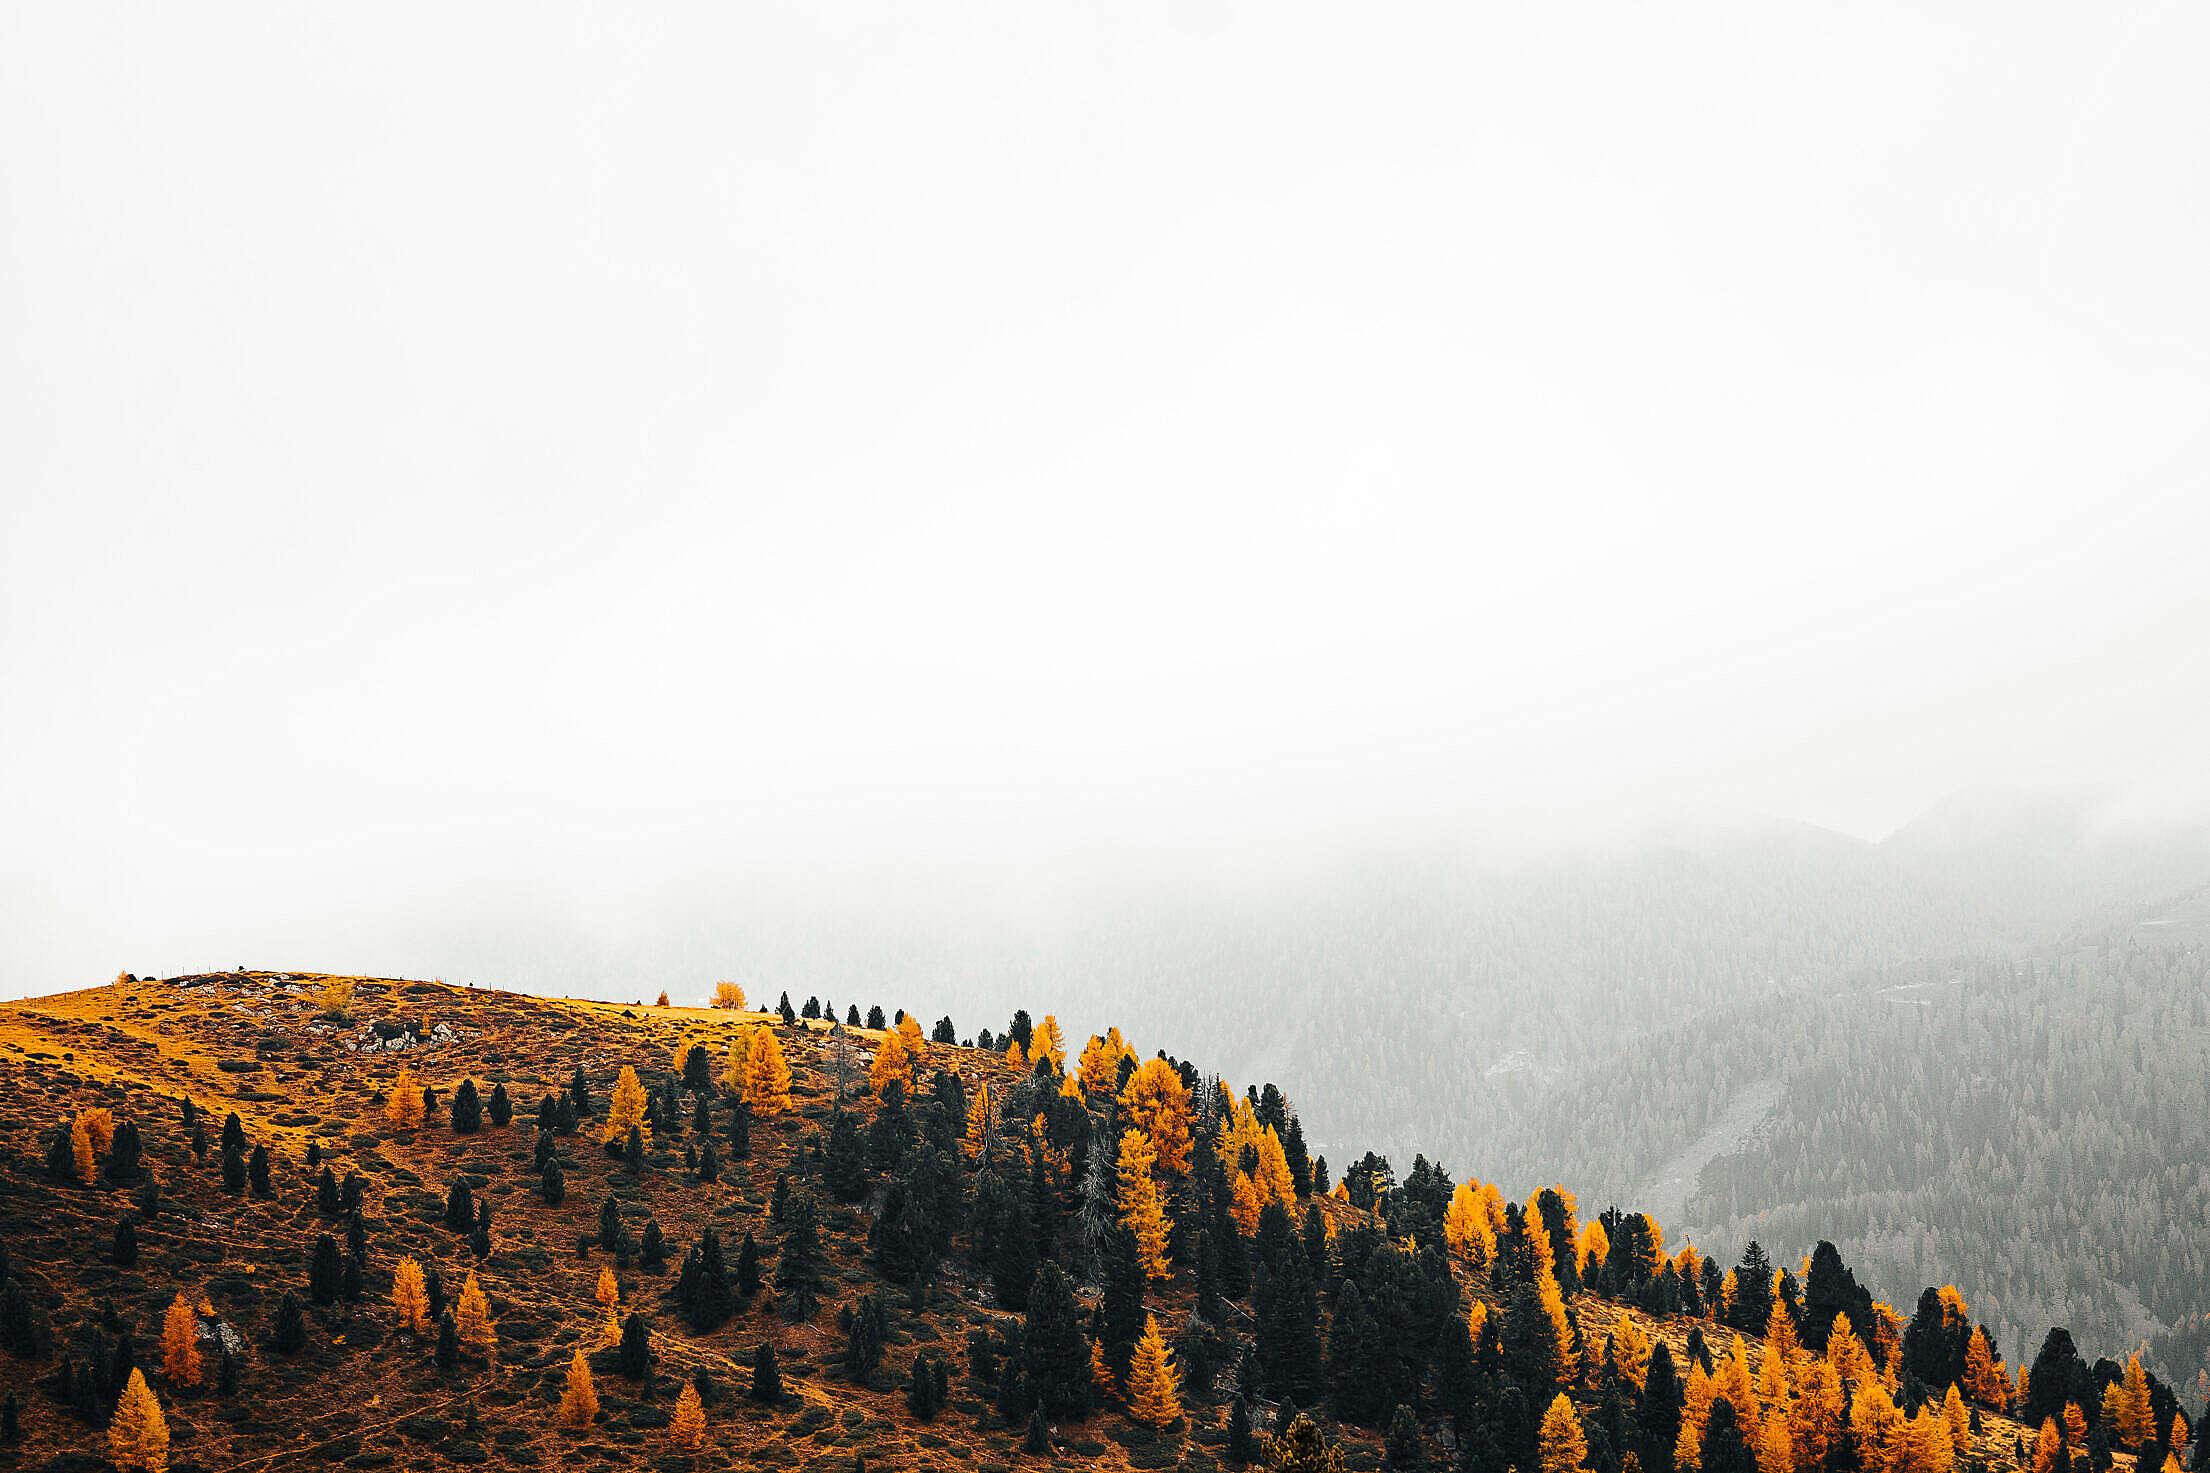 Hill Full of Fall Yellow Trees Free Stock Photo